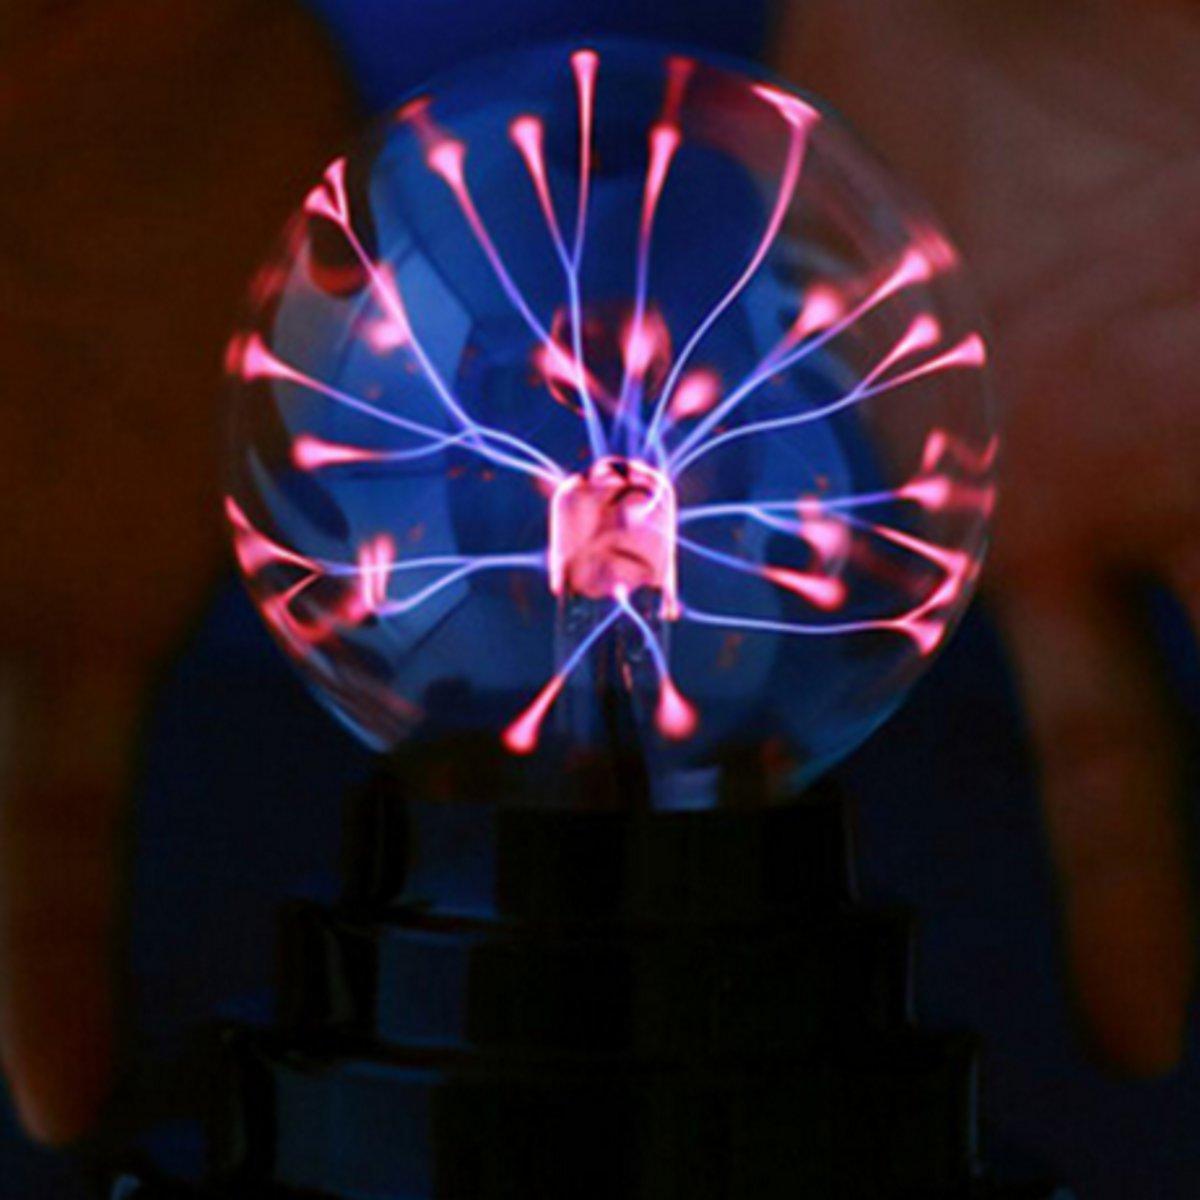 3 Inch Butterfly Plasma Ball Light Table Lamp Cool Magic Fun Science Electricity Desktop Decor